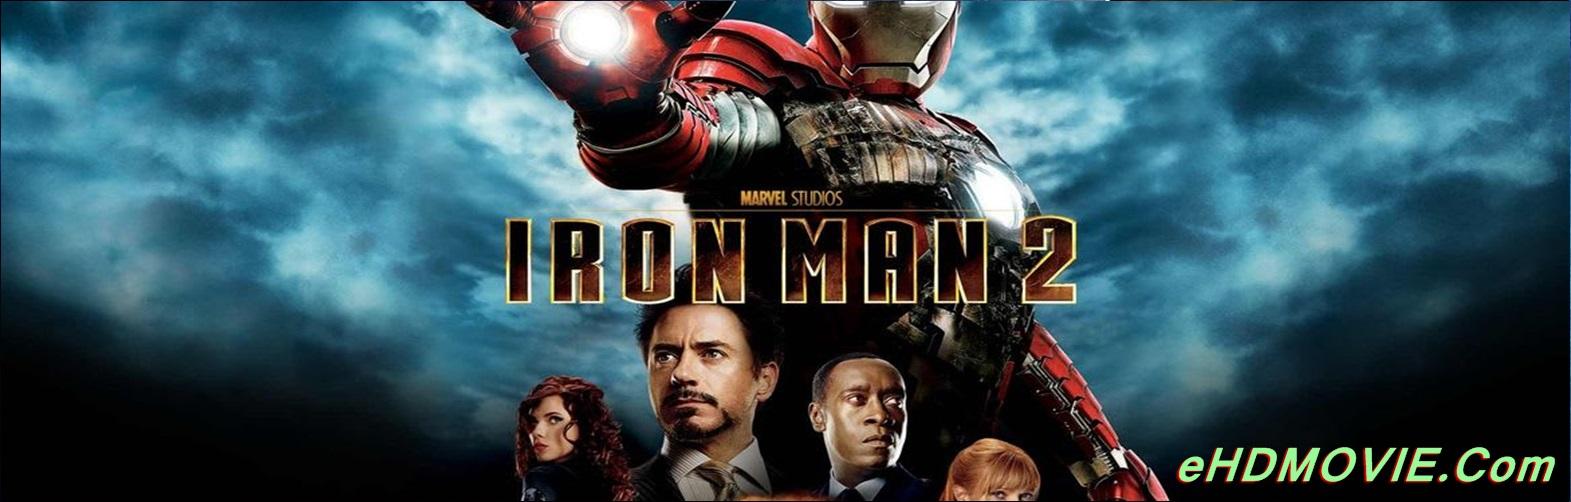 Iron Man 2 2010 Full Movie Dual Audio [Hindi – English] 1080p - 720p - 480p ORG BRRip 350MB - 900MB - 5GB ESubs Free Download